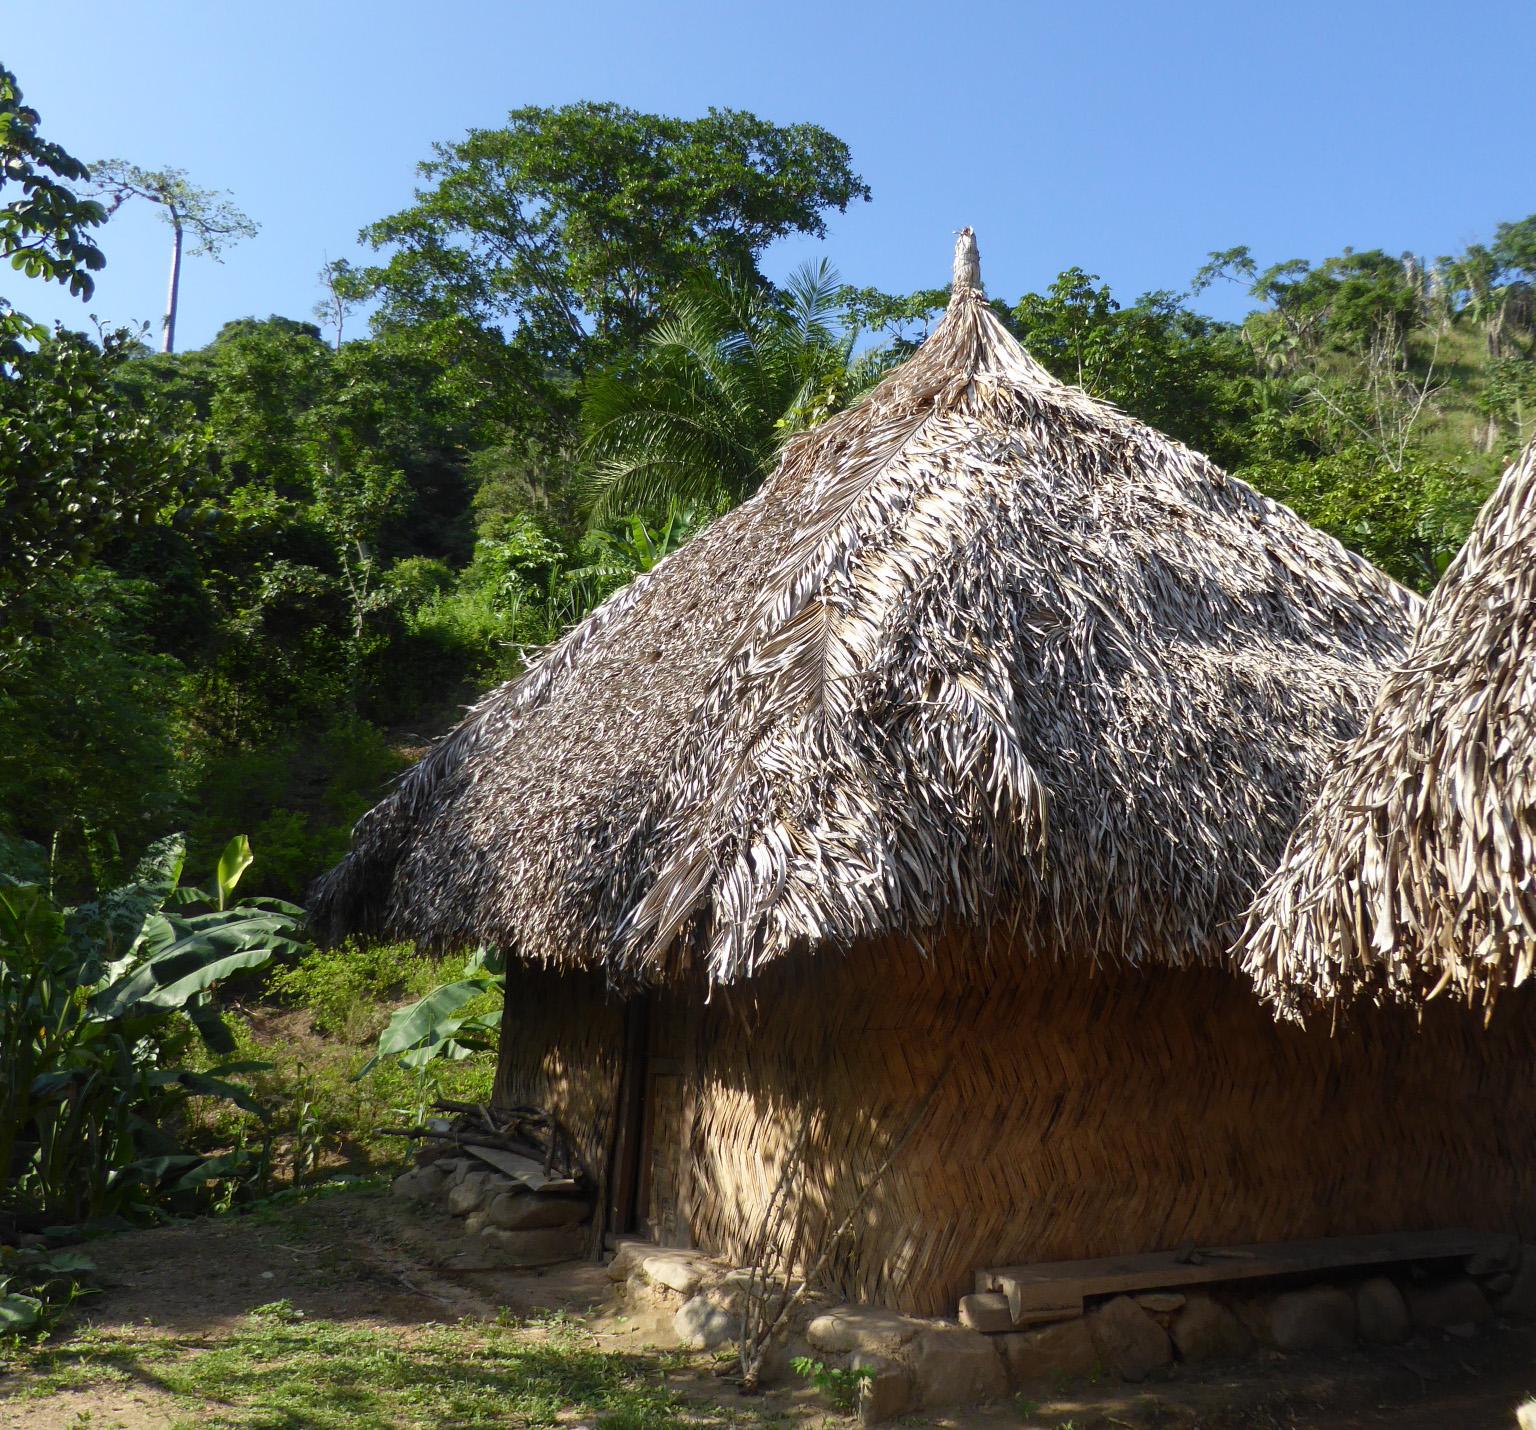 Maison indigène des Arhuacos